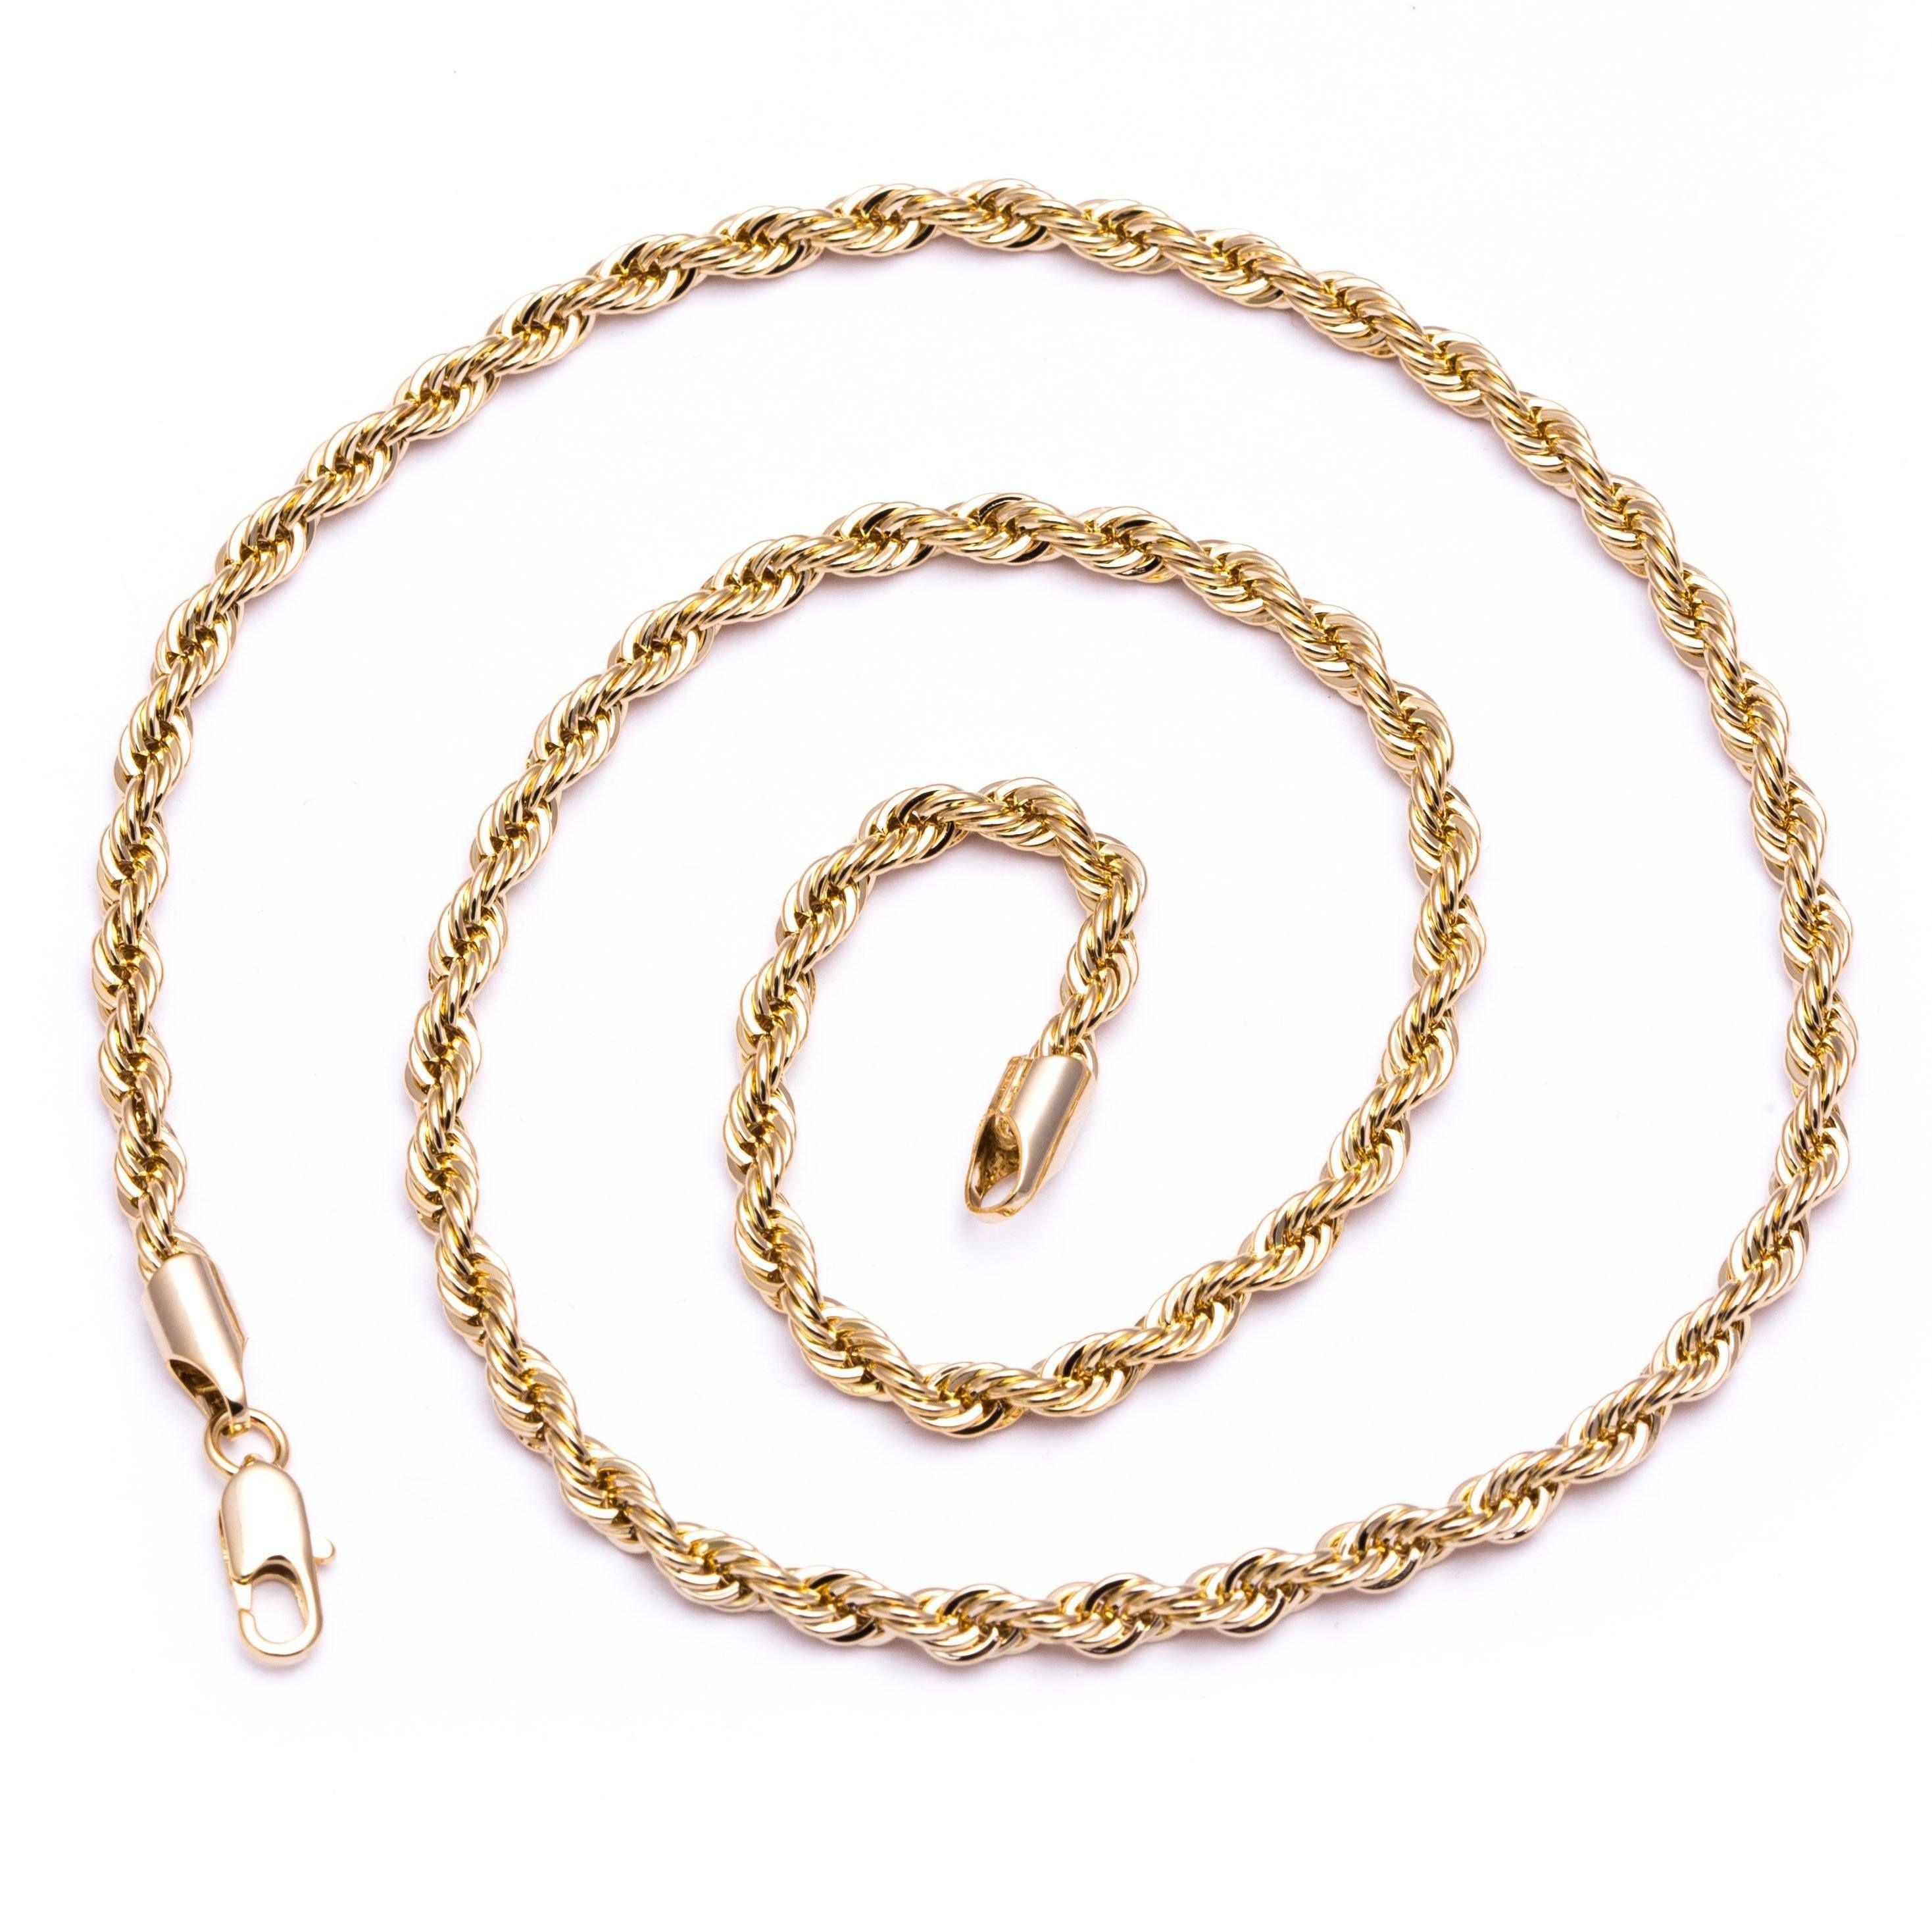 Menus luxury k gold plated mm bling solid diamondcut rope chain